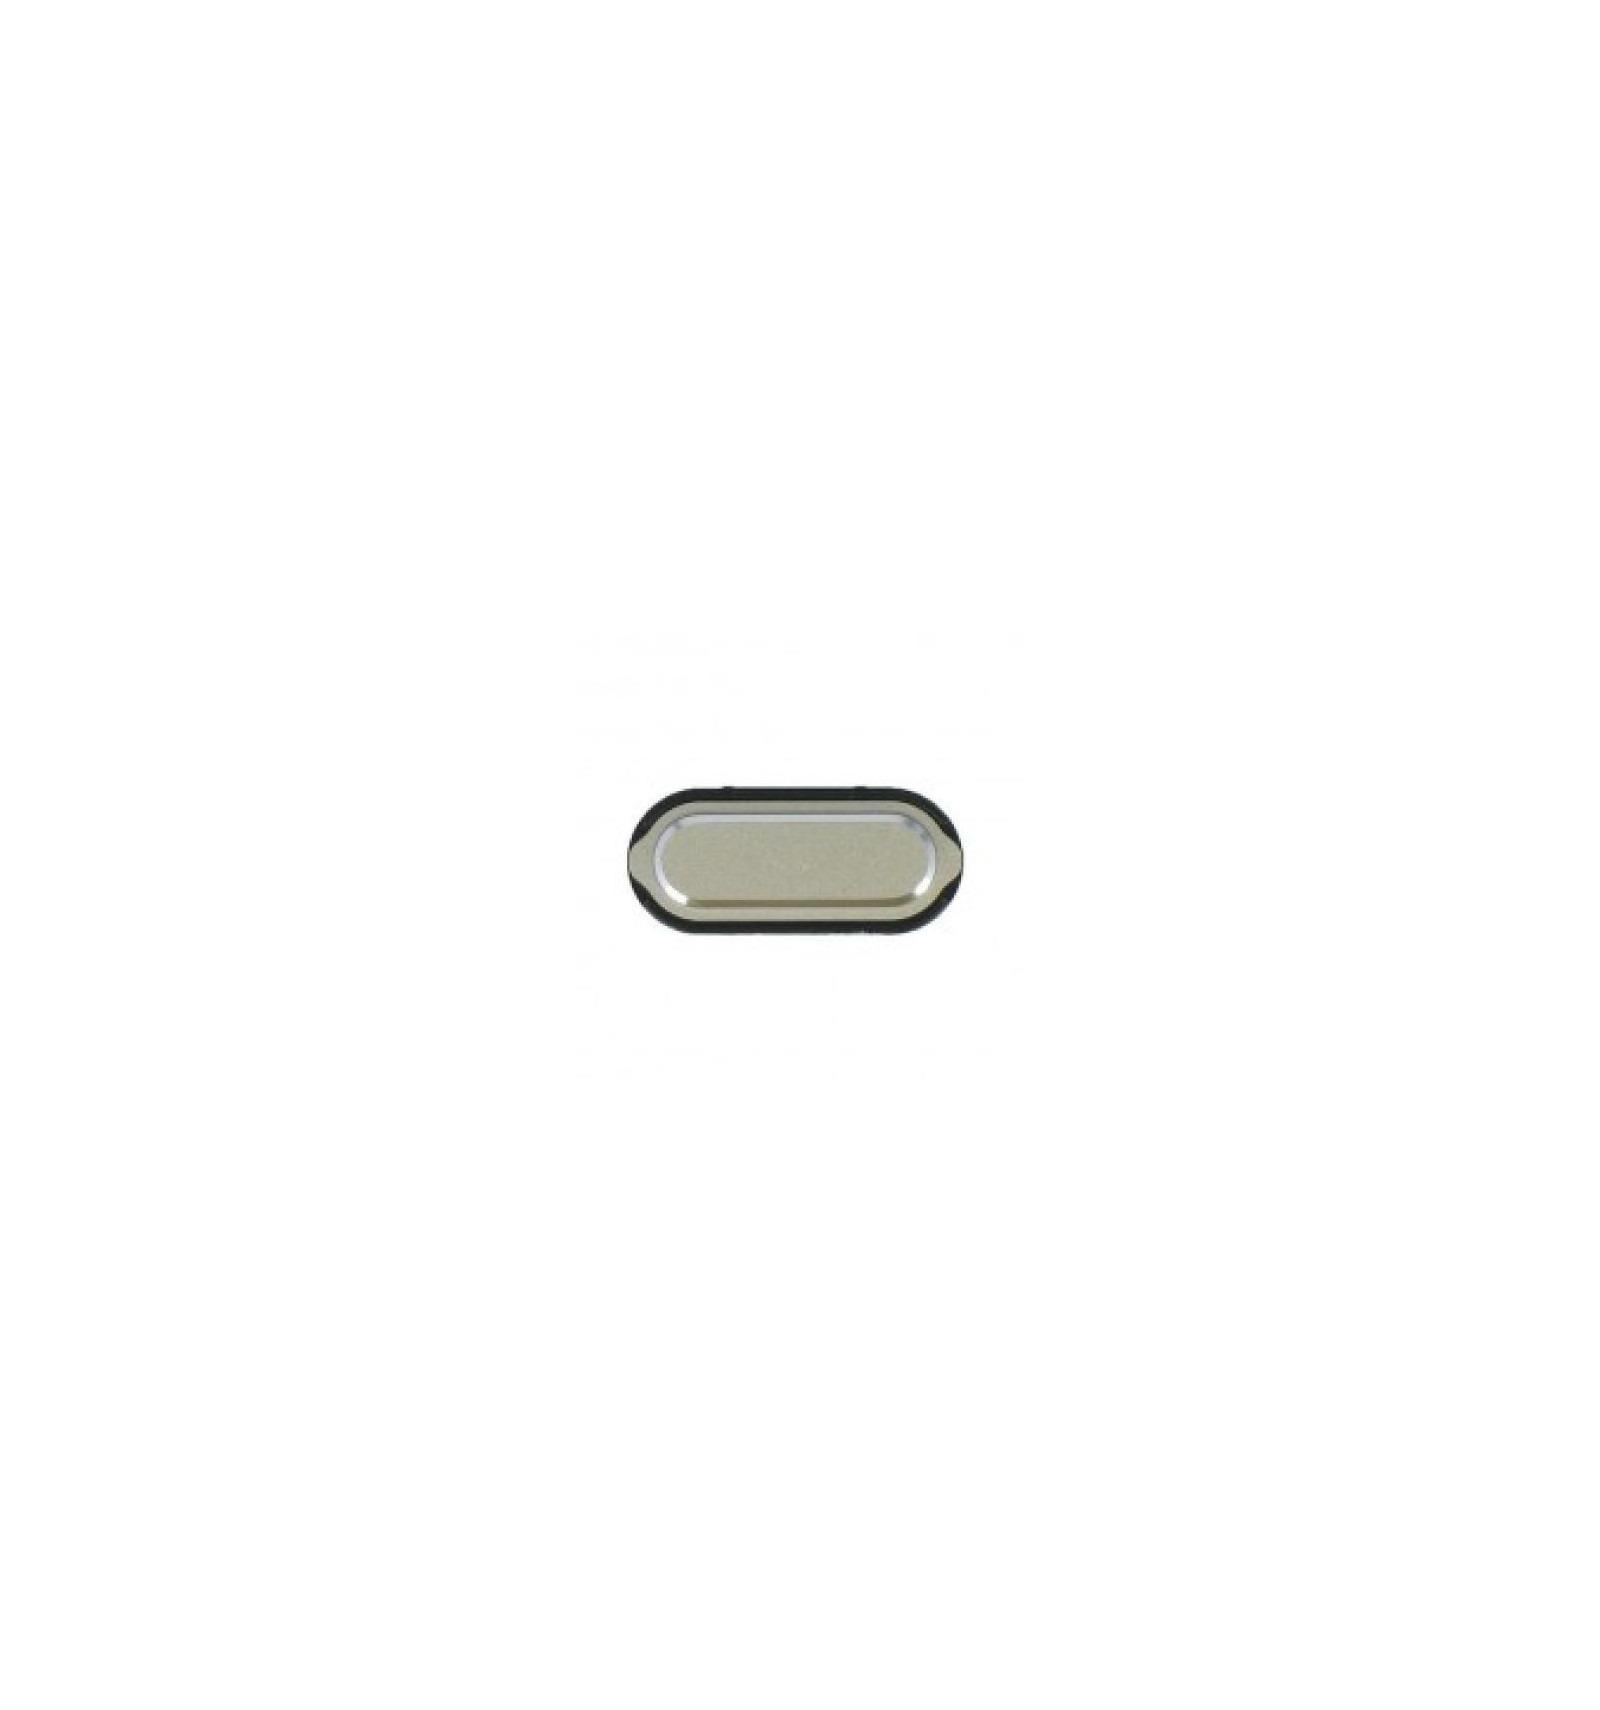 Samsung Galaxy A3 A5 A7 original gold home button